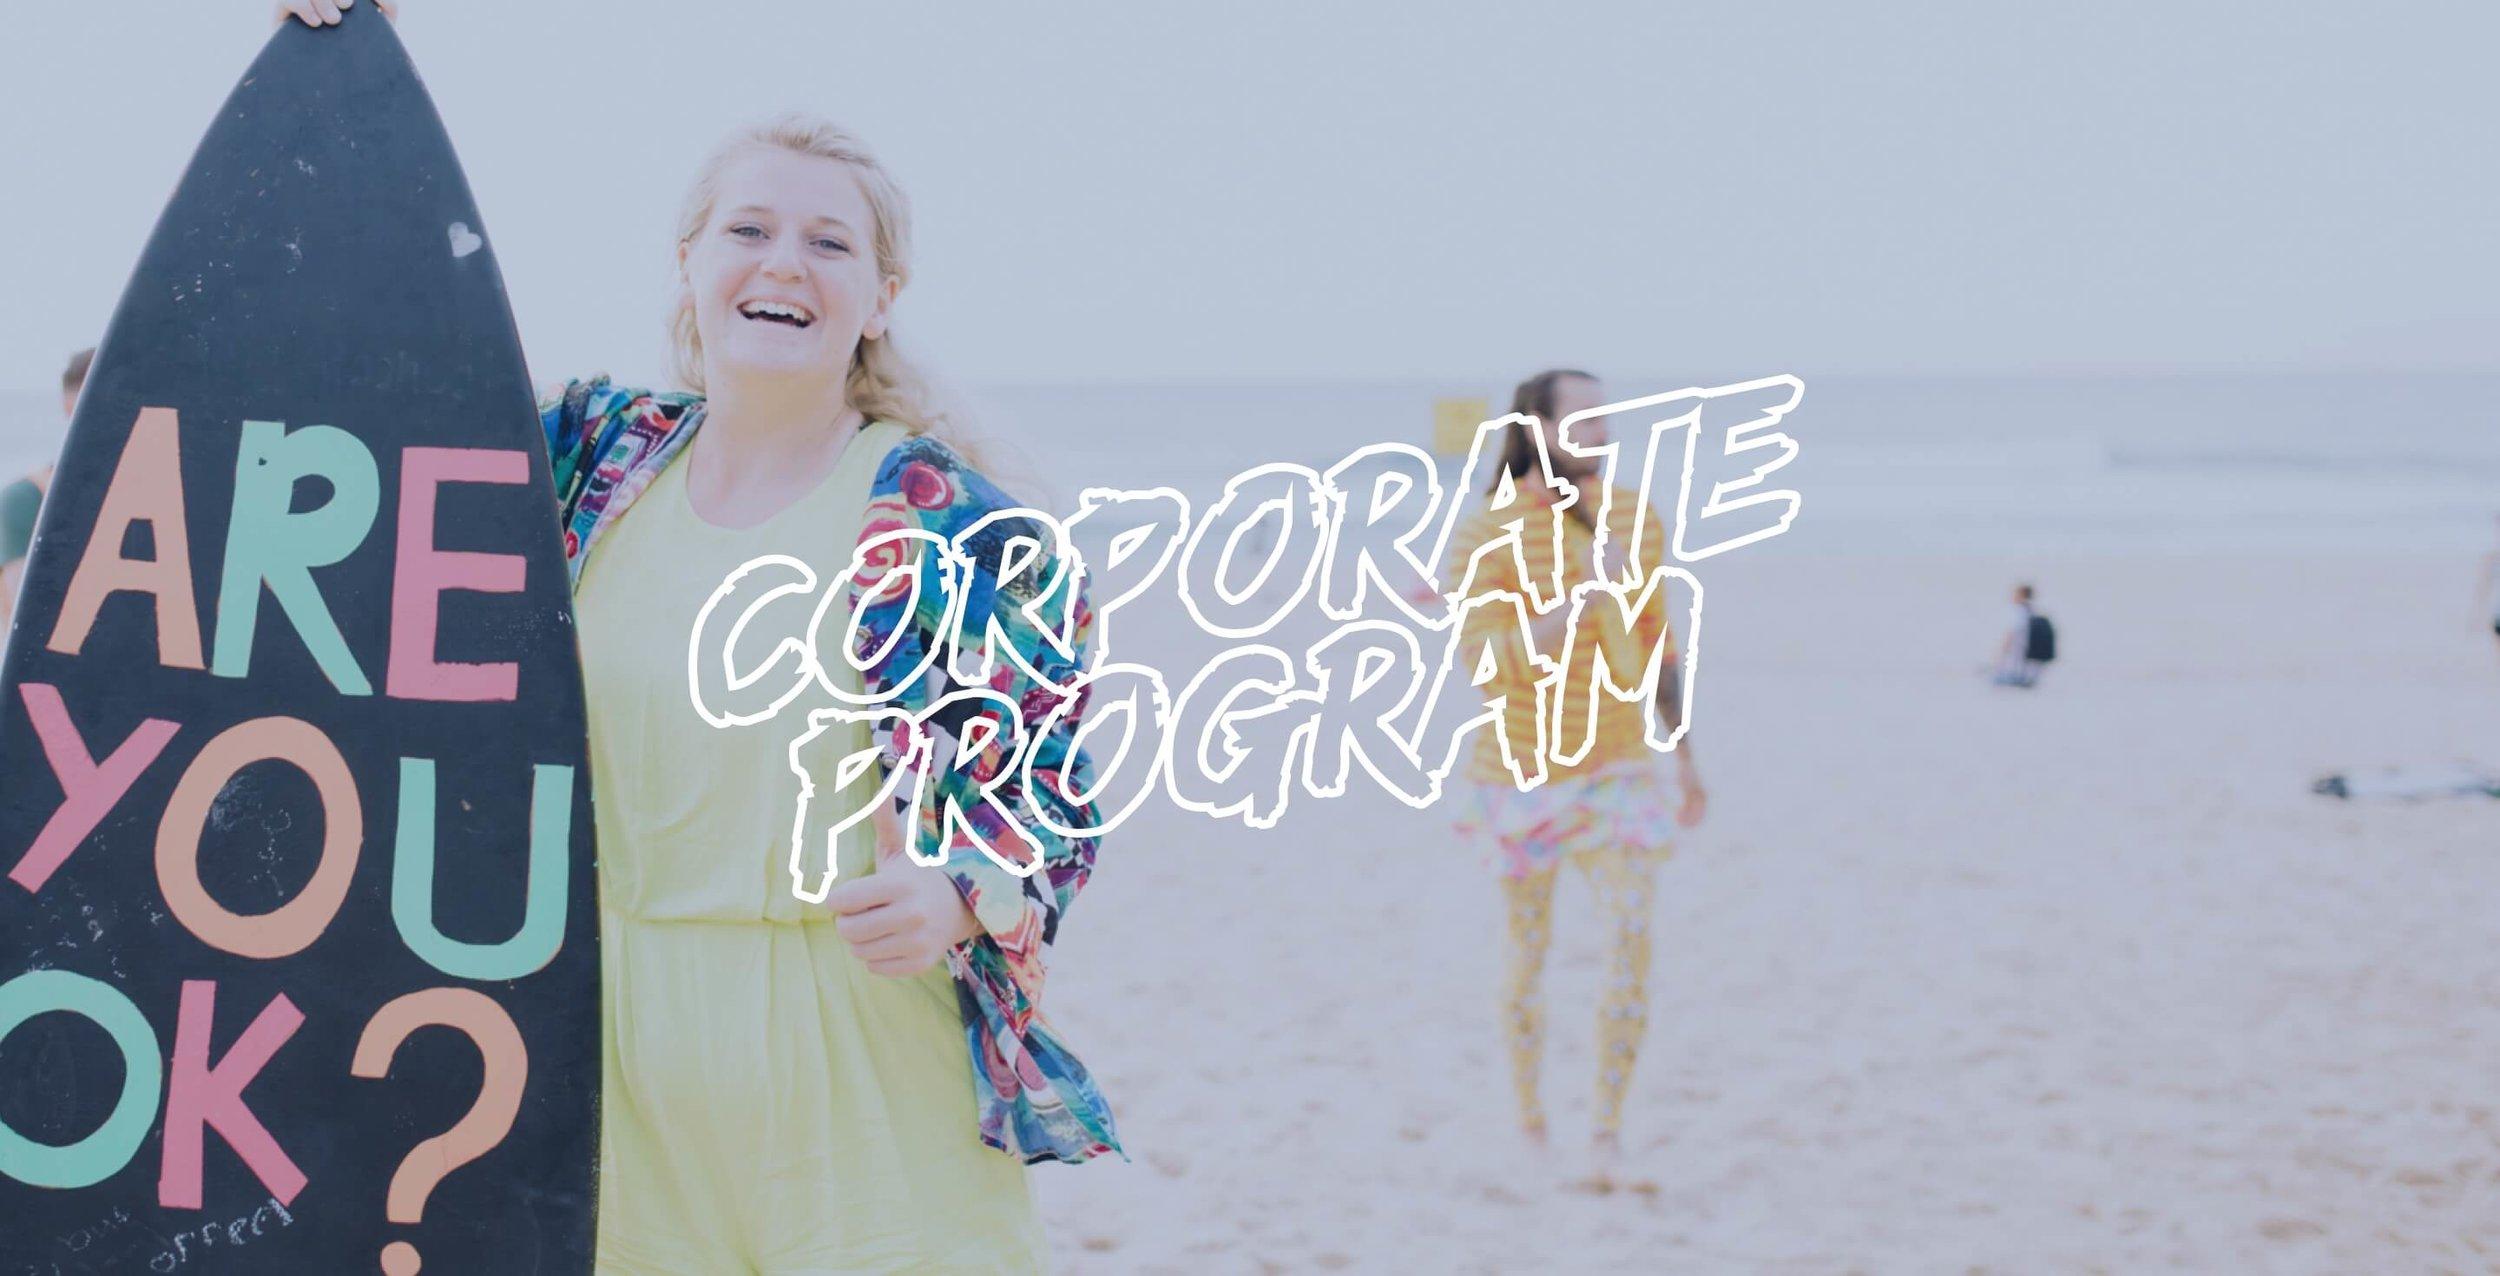 corporate.jpg